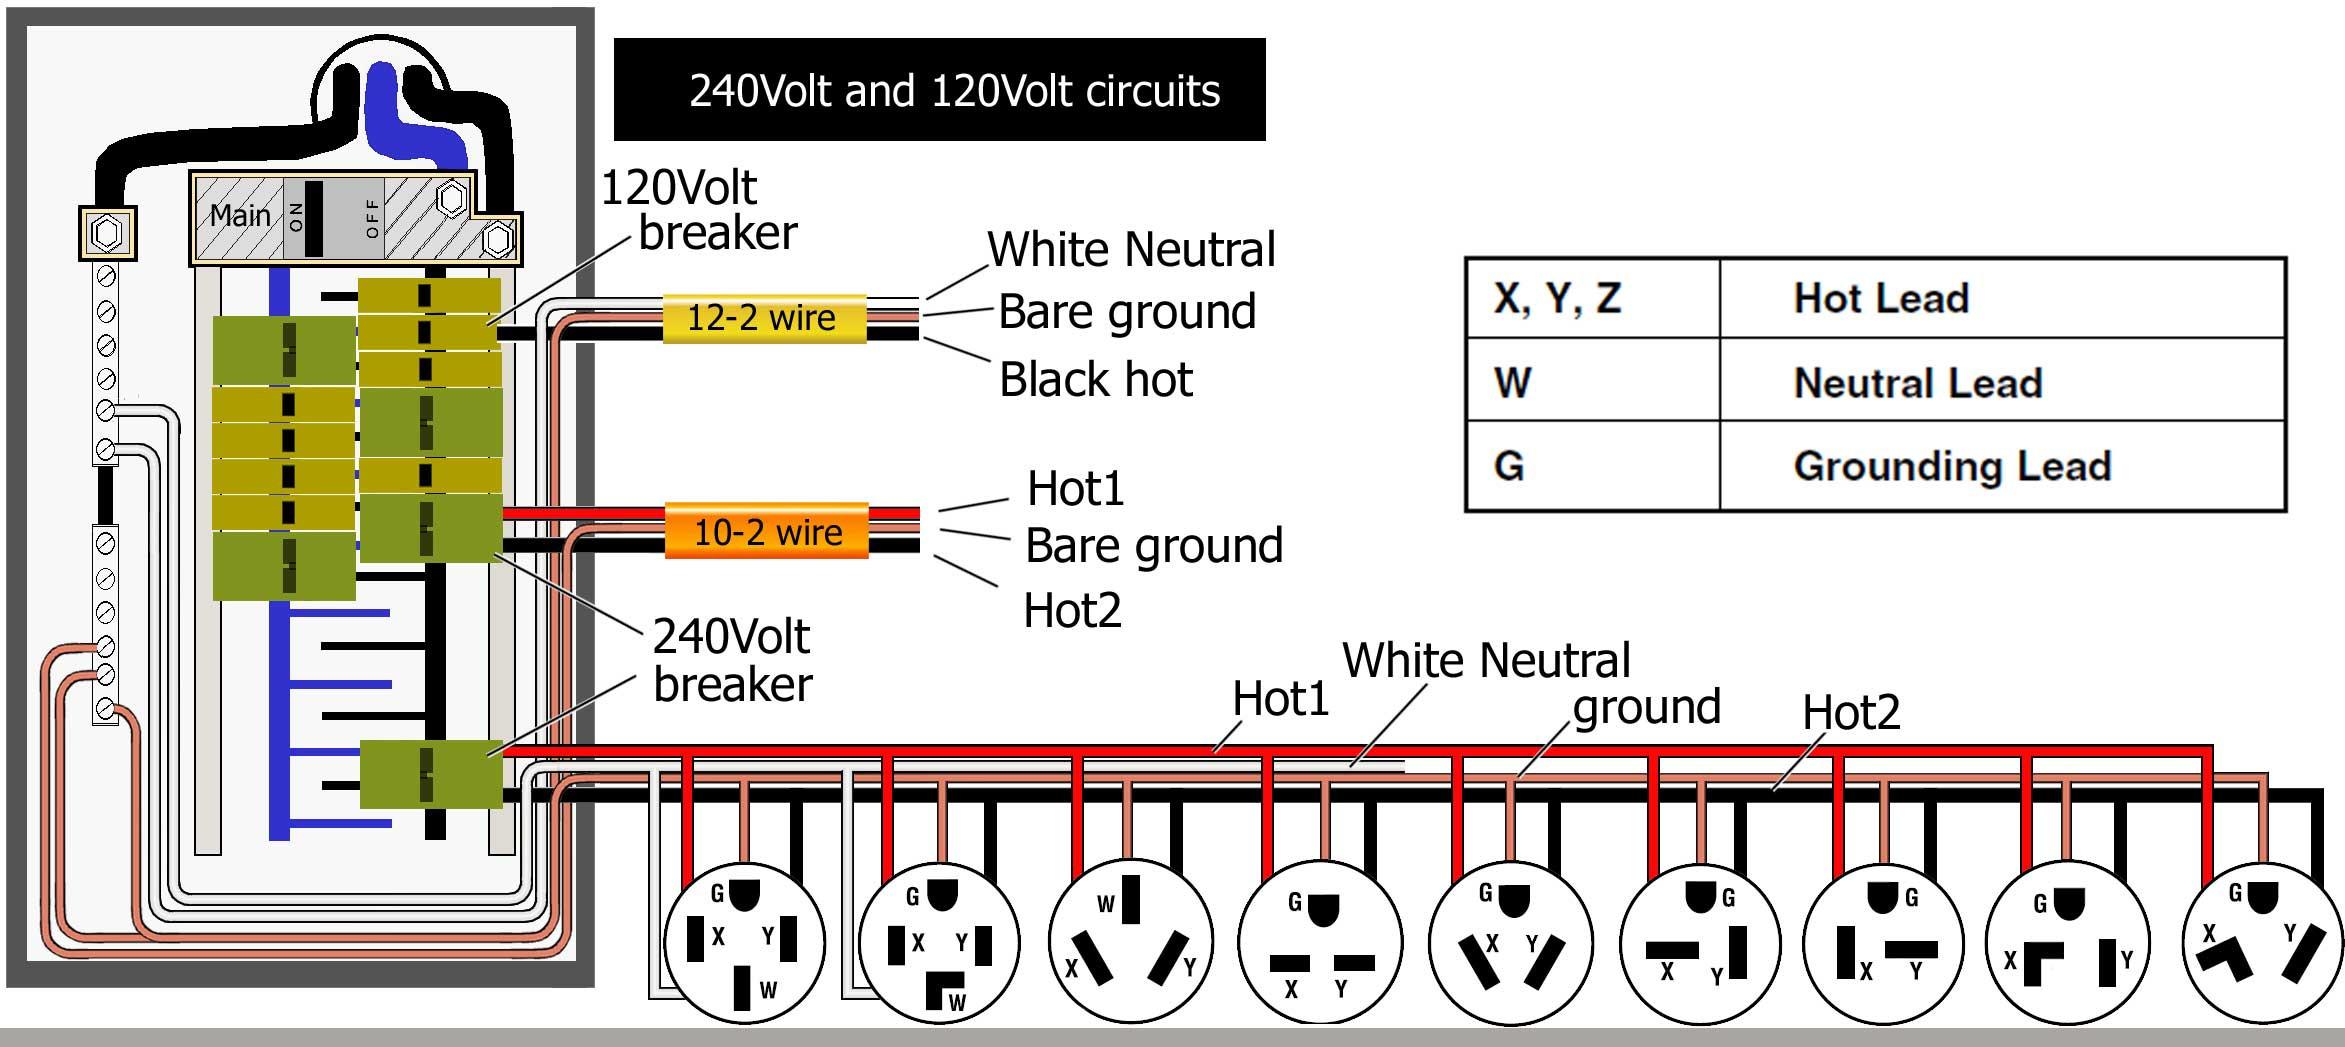 Amp Wiring Diagrams 240 | Wiring Library - 50 Amp Twist Lock Plug Wiring Diagram